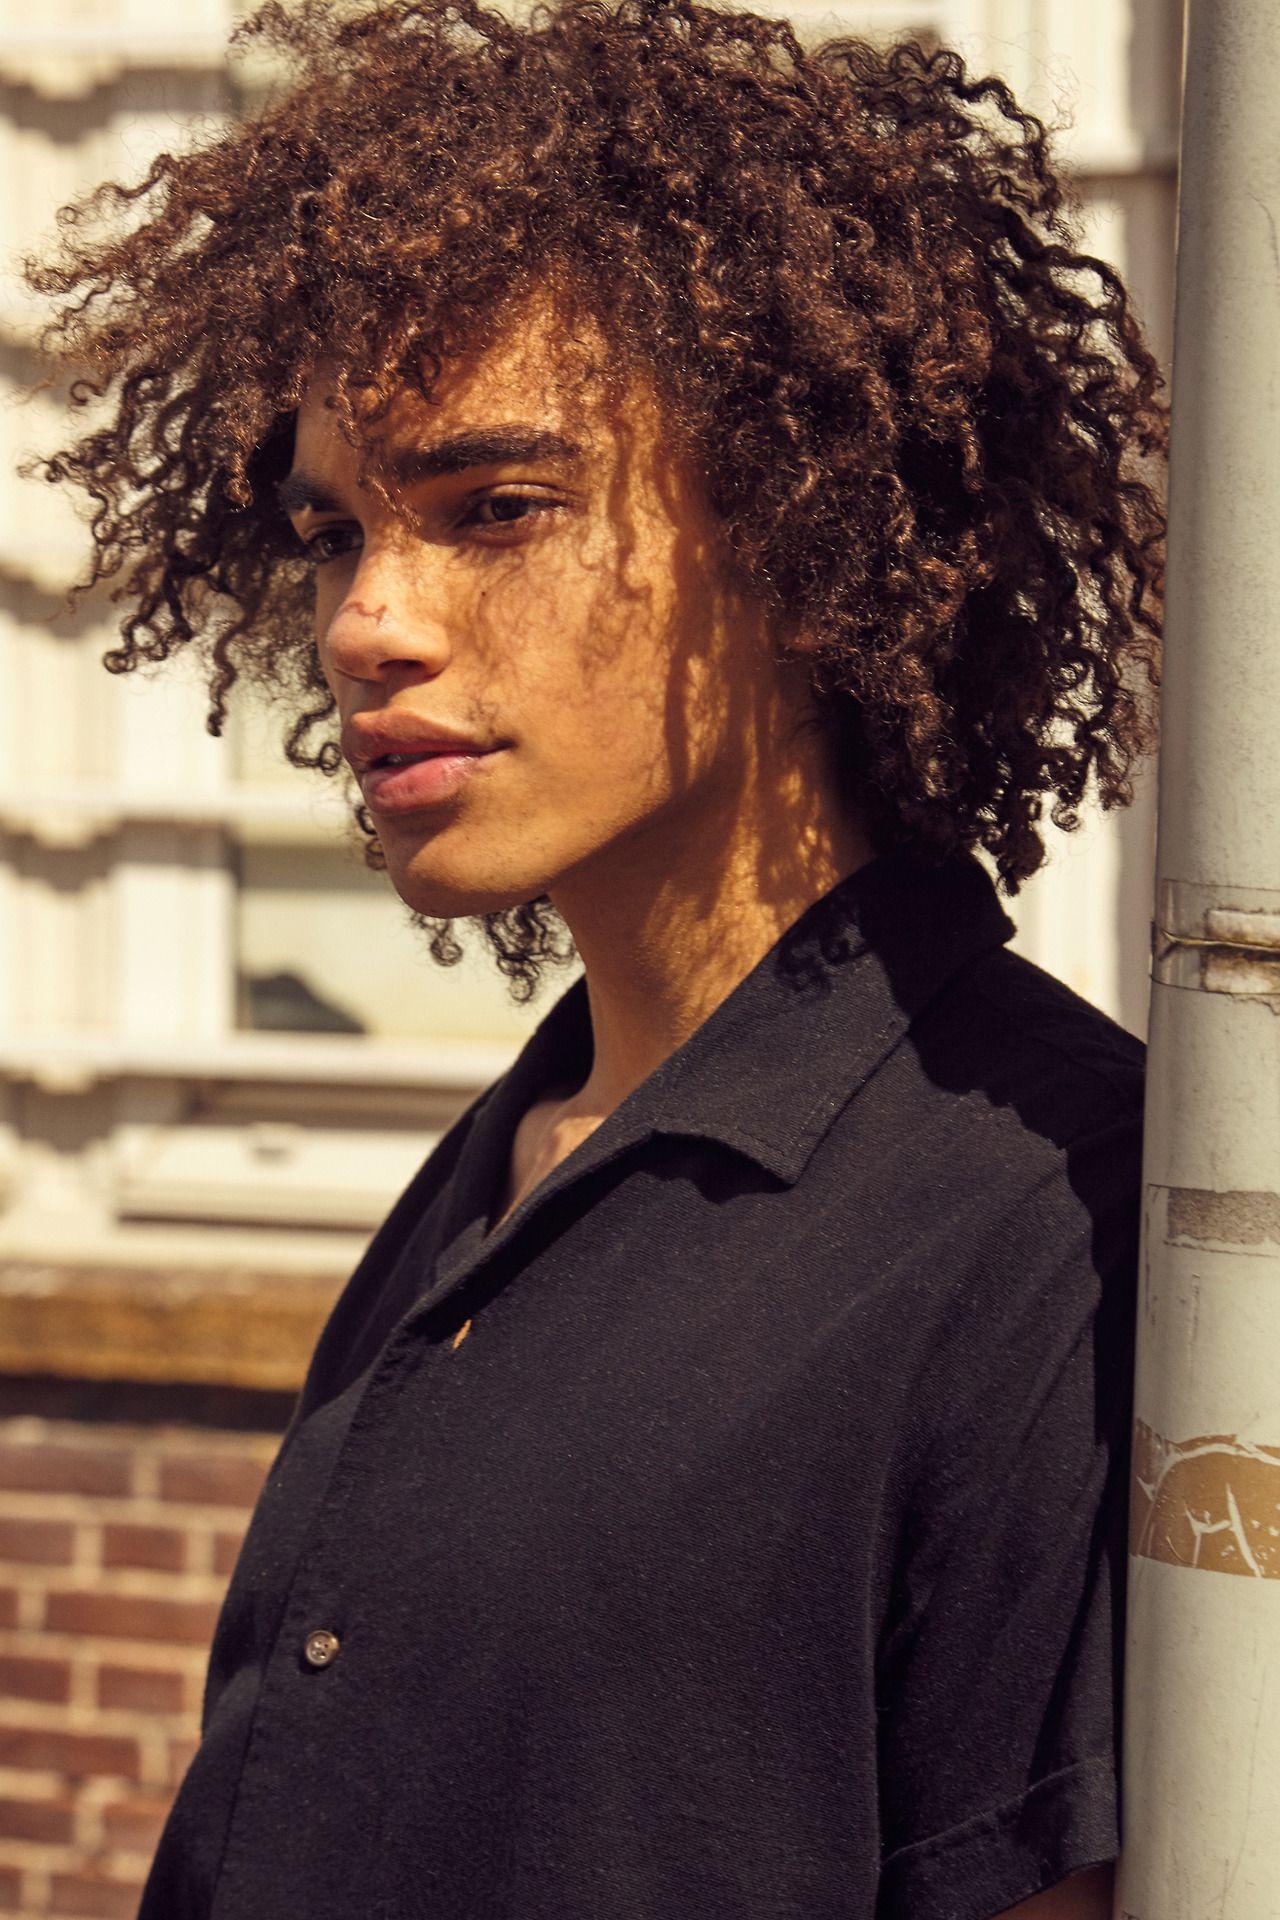 Pinterest Keraavlon Natural Hair Funky Afro Hair Style In 2020 Long Hair Styles Men Curly Hair Men Light Skin Boys